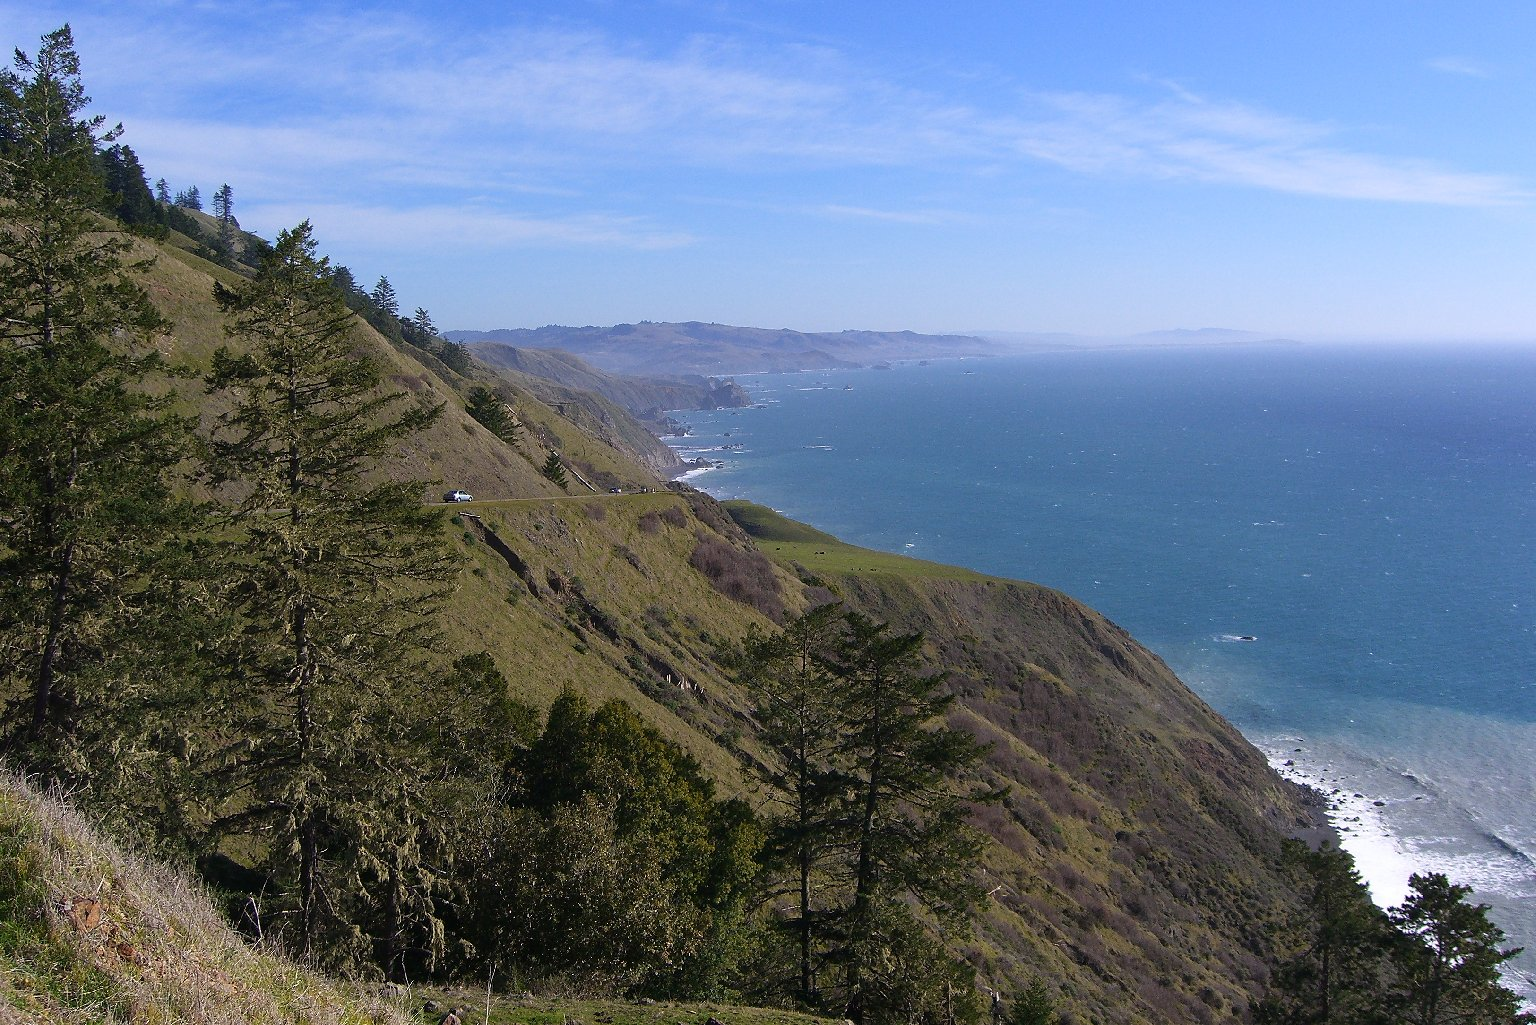 Sonoma County coastline, as seen from Highway 1 north of Jenner. (Dan Brekke/KQED)